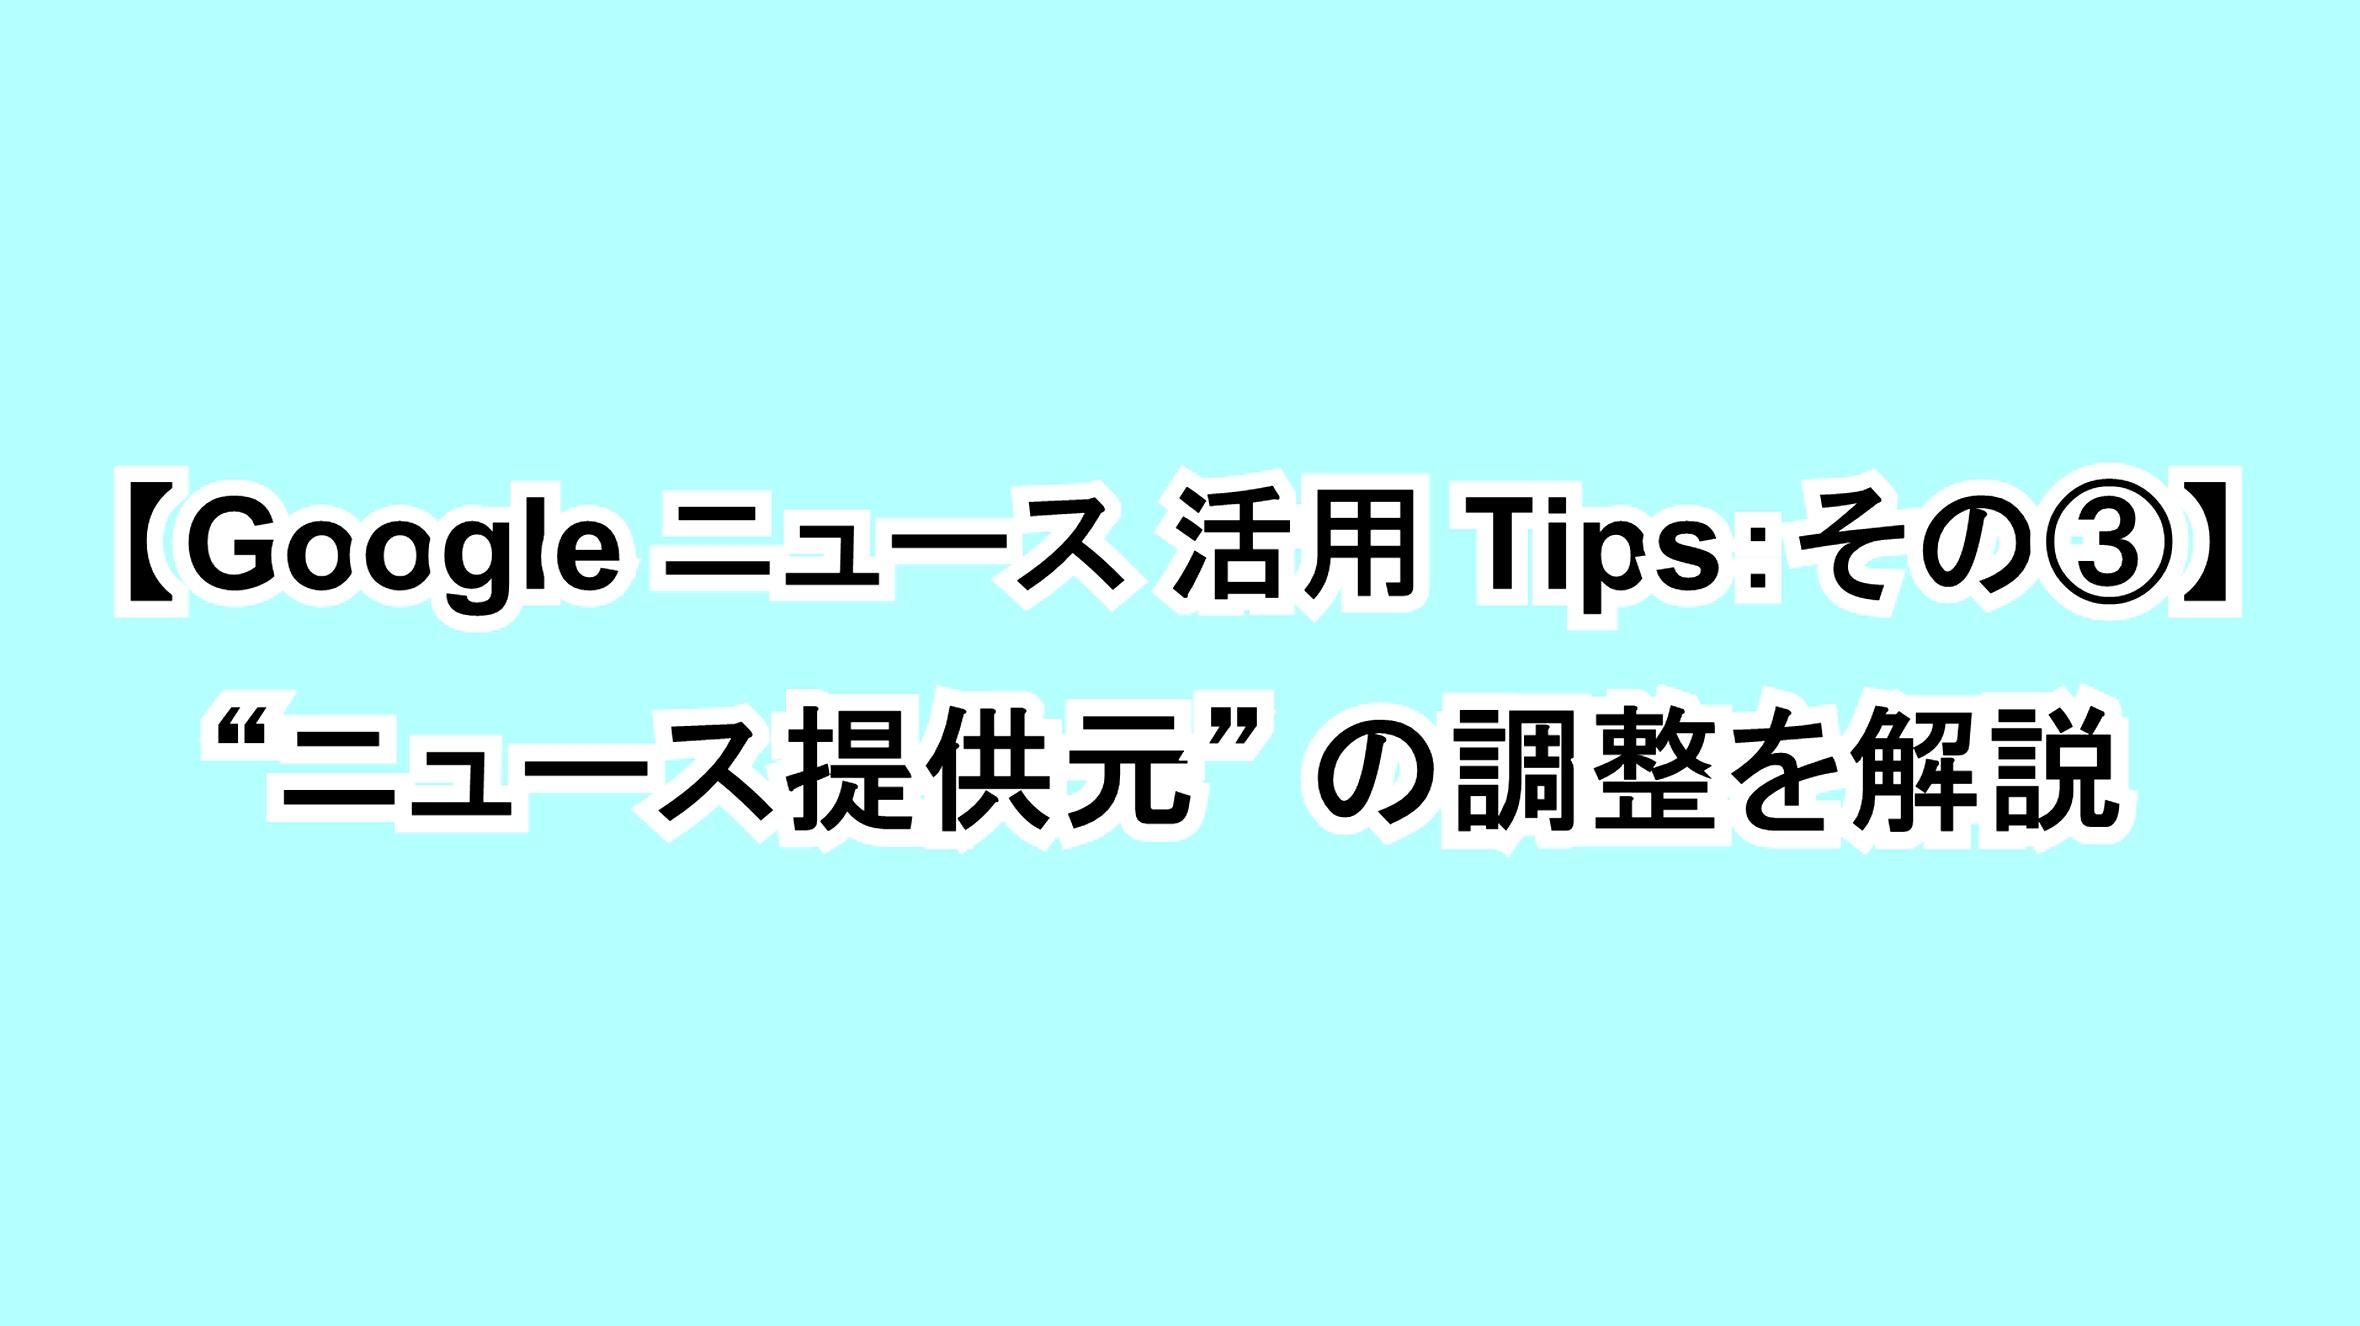 "【Google ニュース活用Tips:その③】""ニュース提供元""の調整を解説"